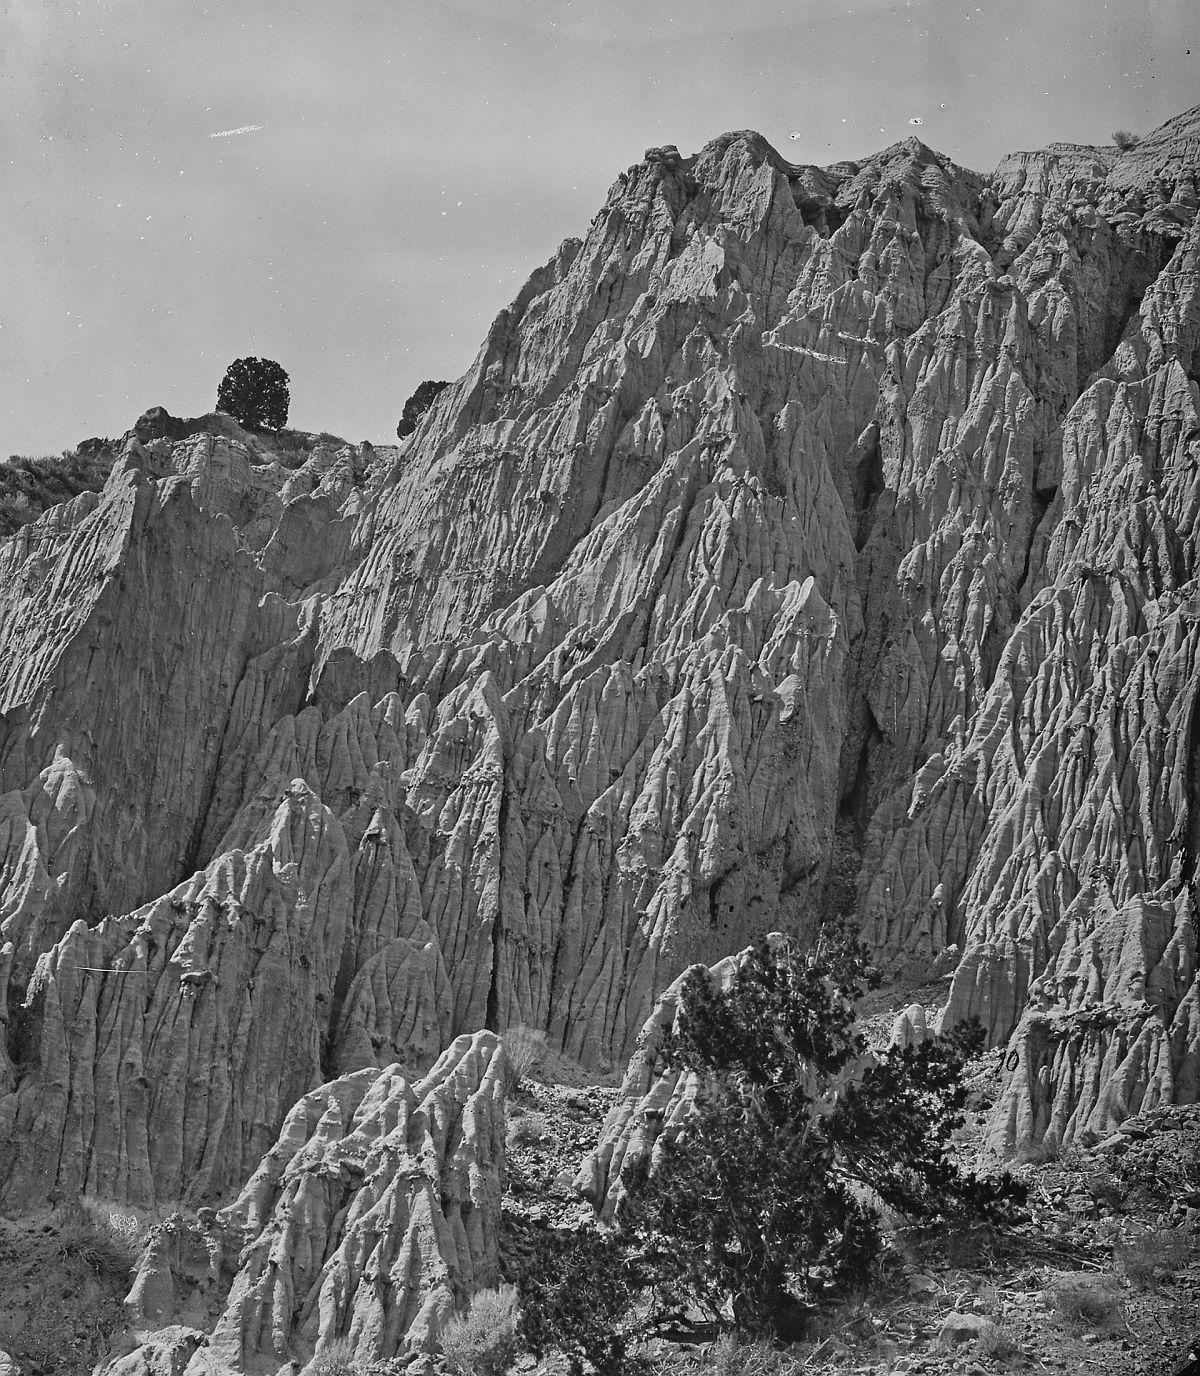 Salt Creek Canyon, Utah